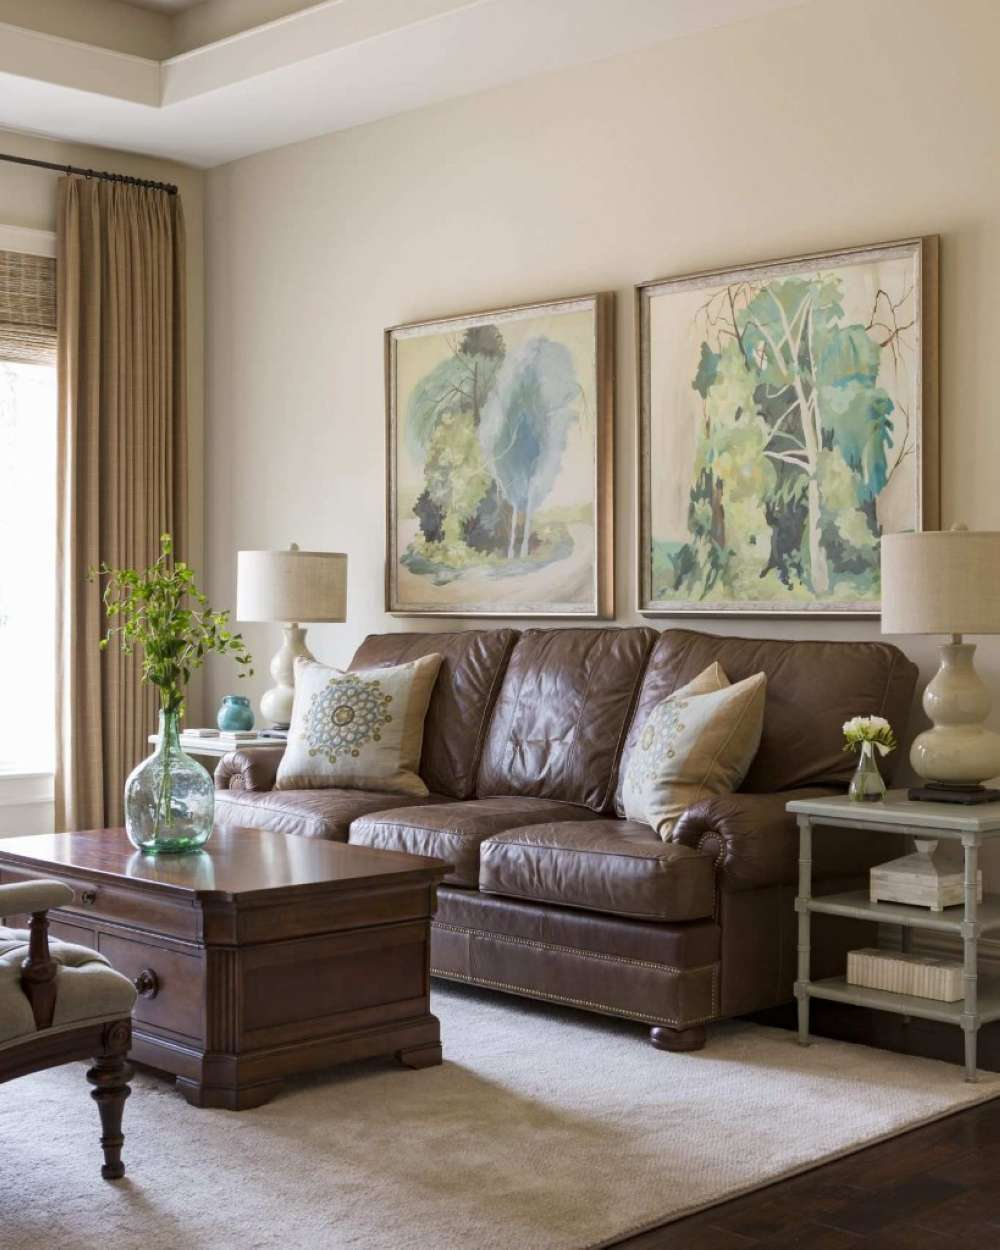 Krista-Lewis-Interior-Design-Arkansas-Naturally-Neutral_007Optmized